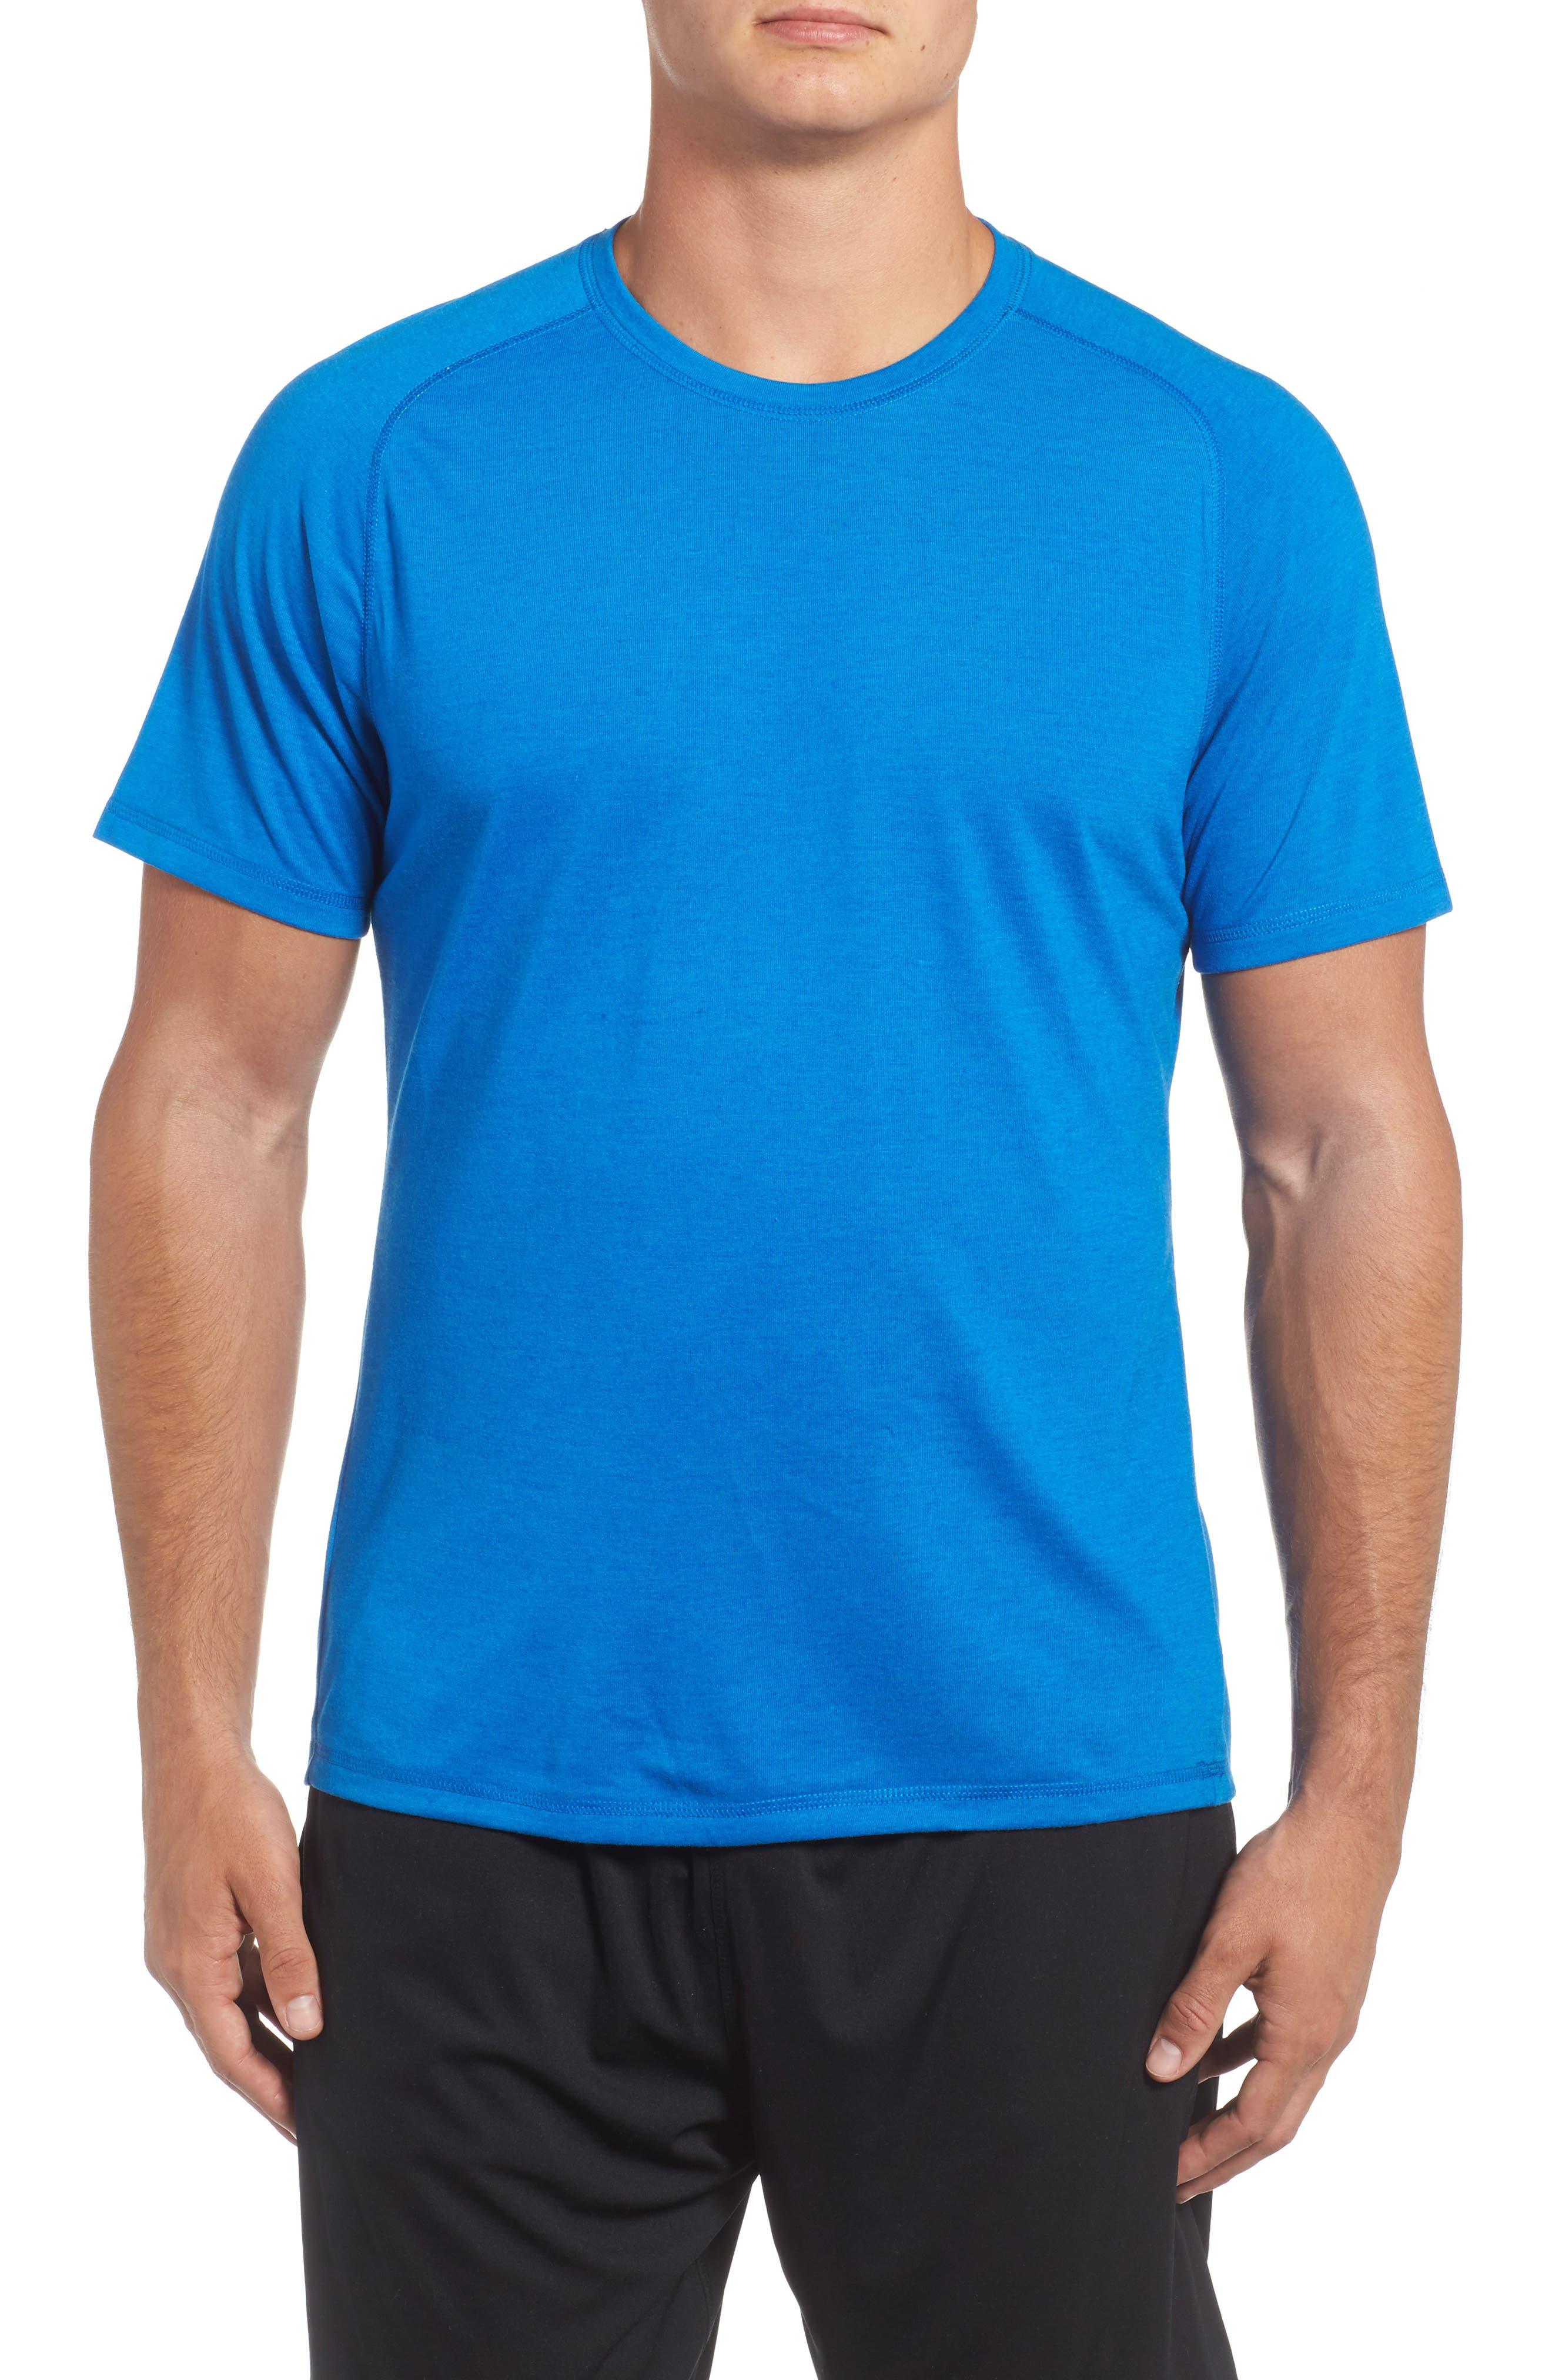 Main Image - Zella Celsian Training T-Shirt